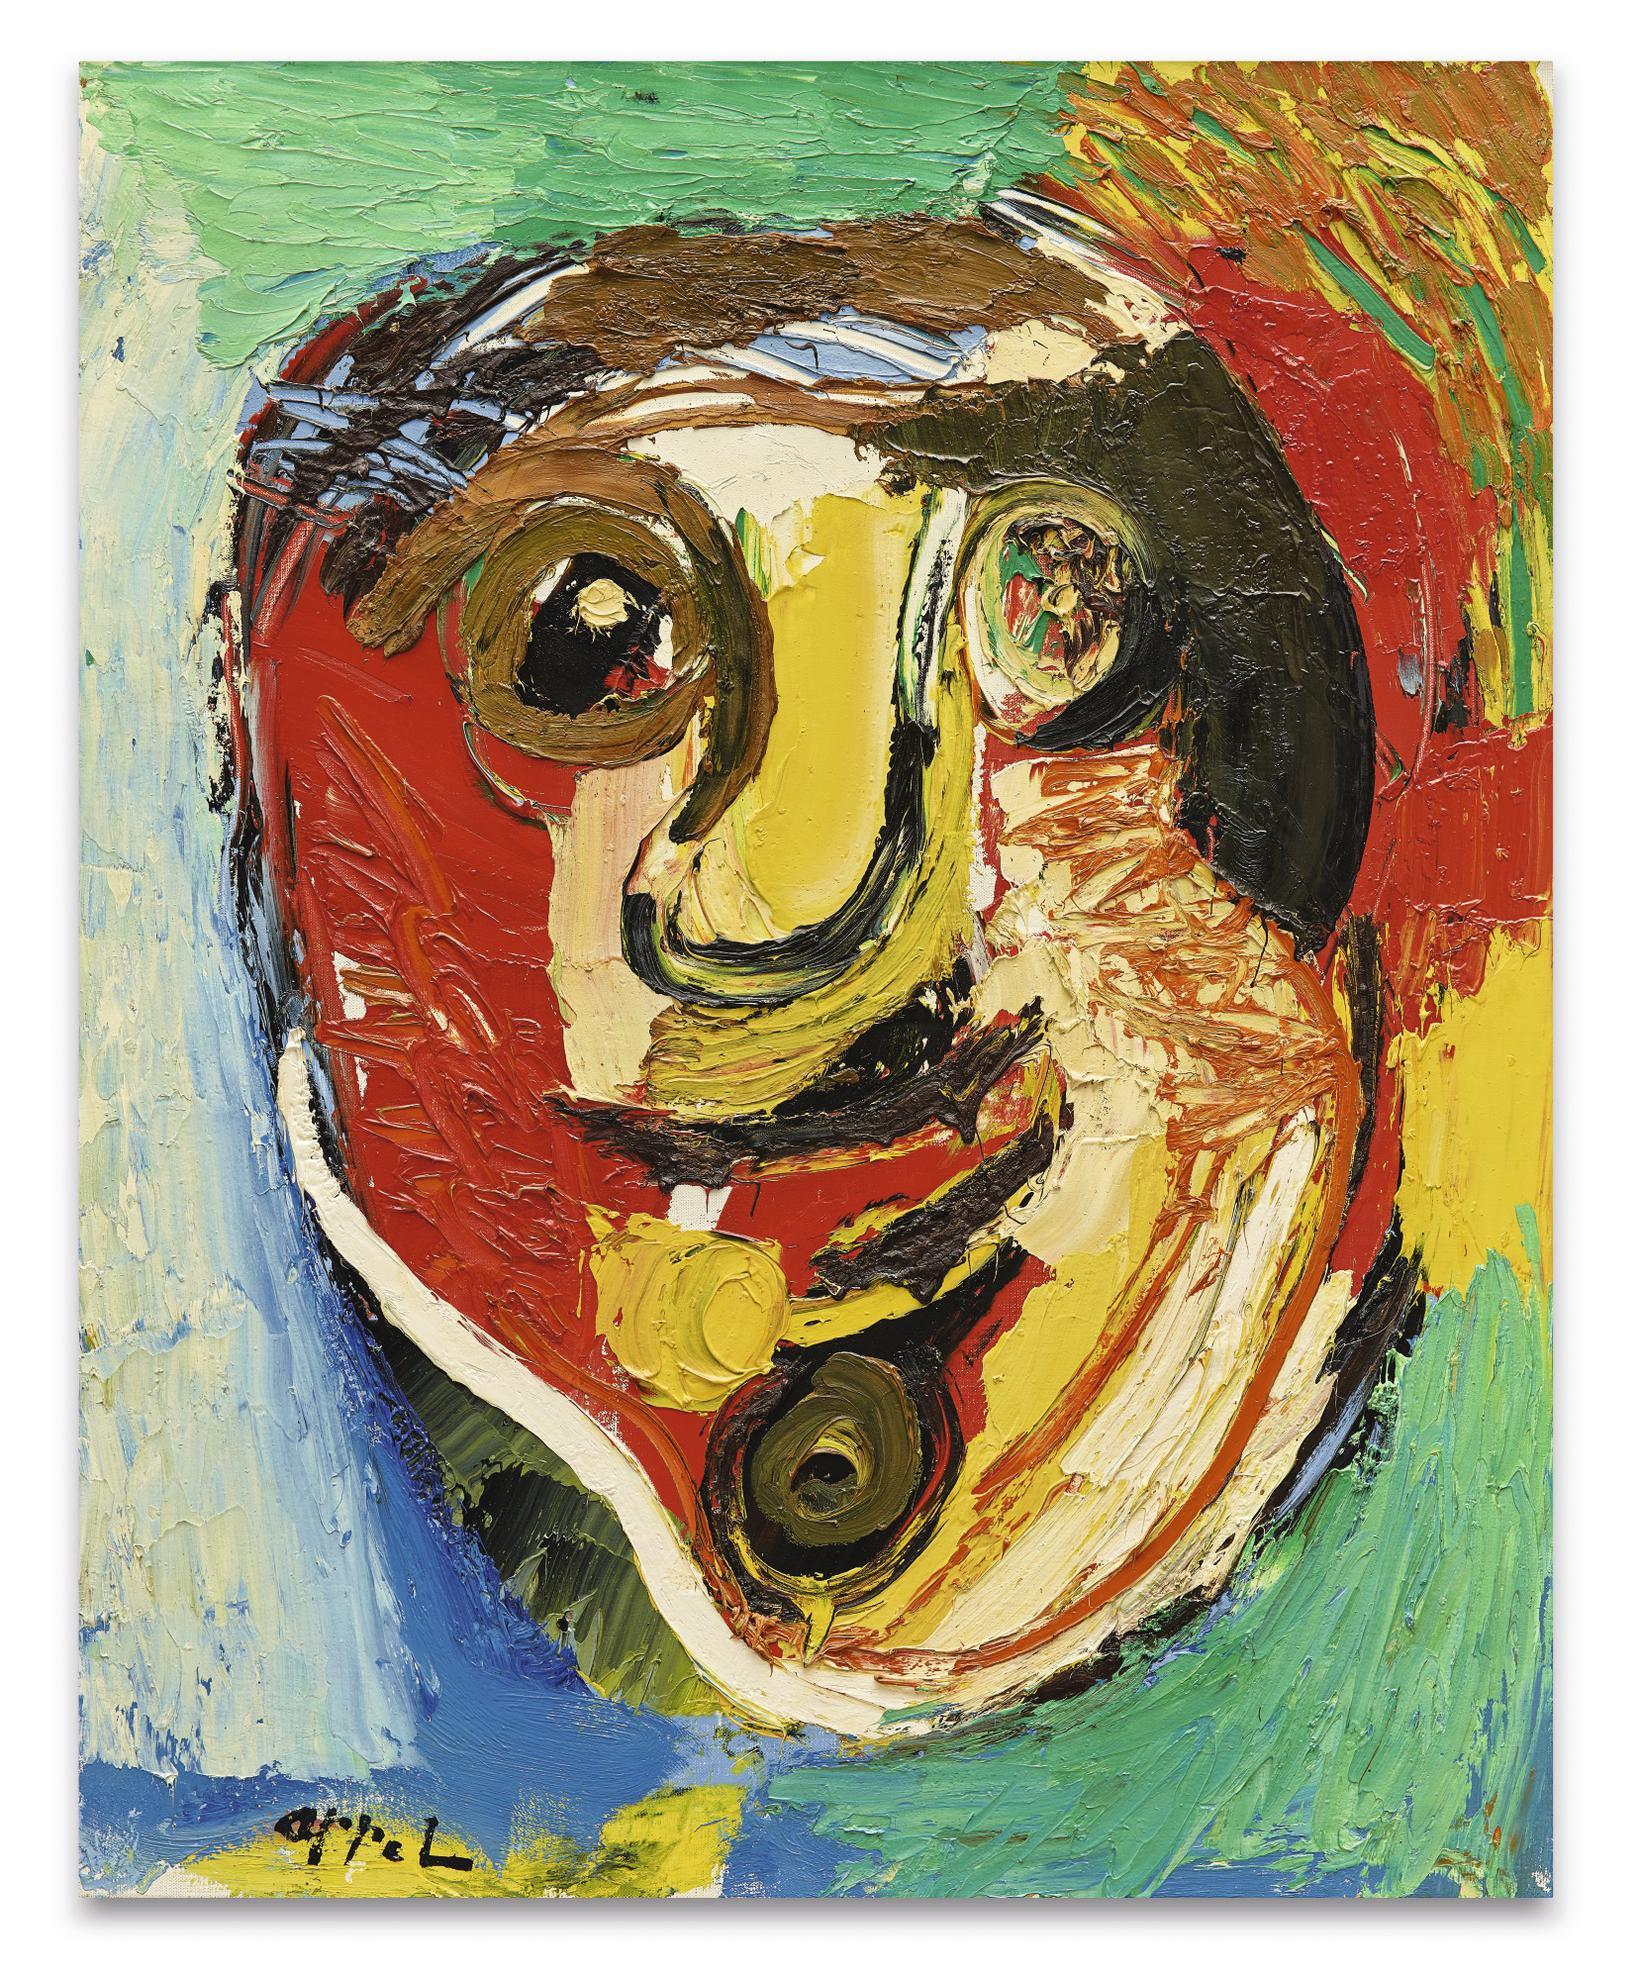 Karel Appel-Portrait-1966